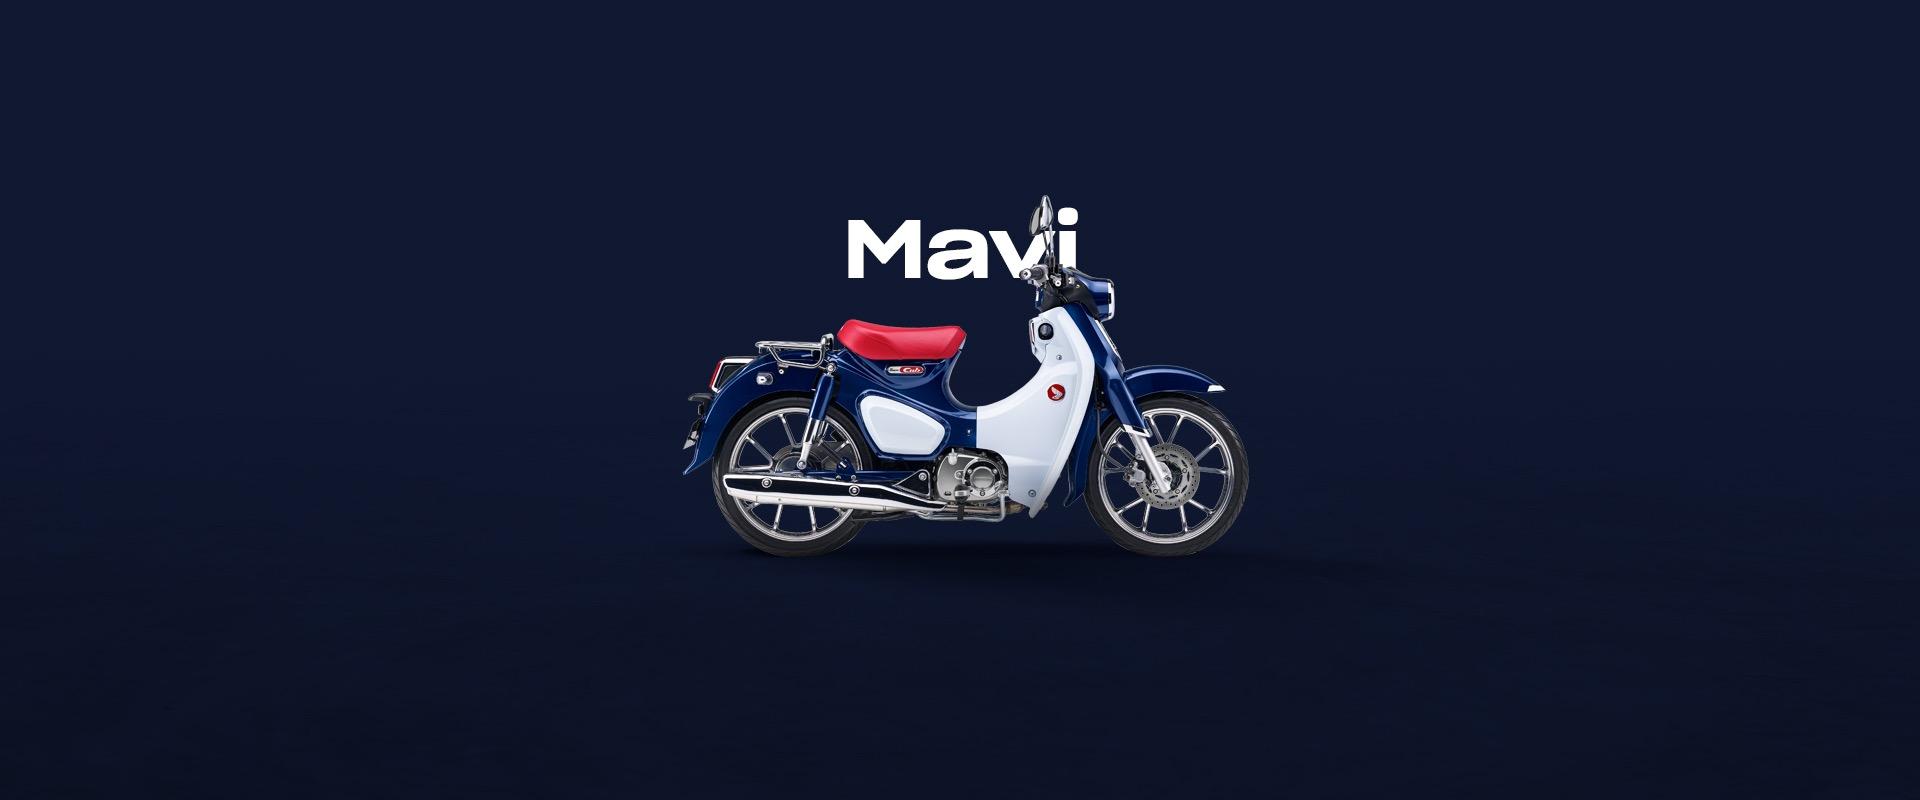 Honda Tansoy Mavi